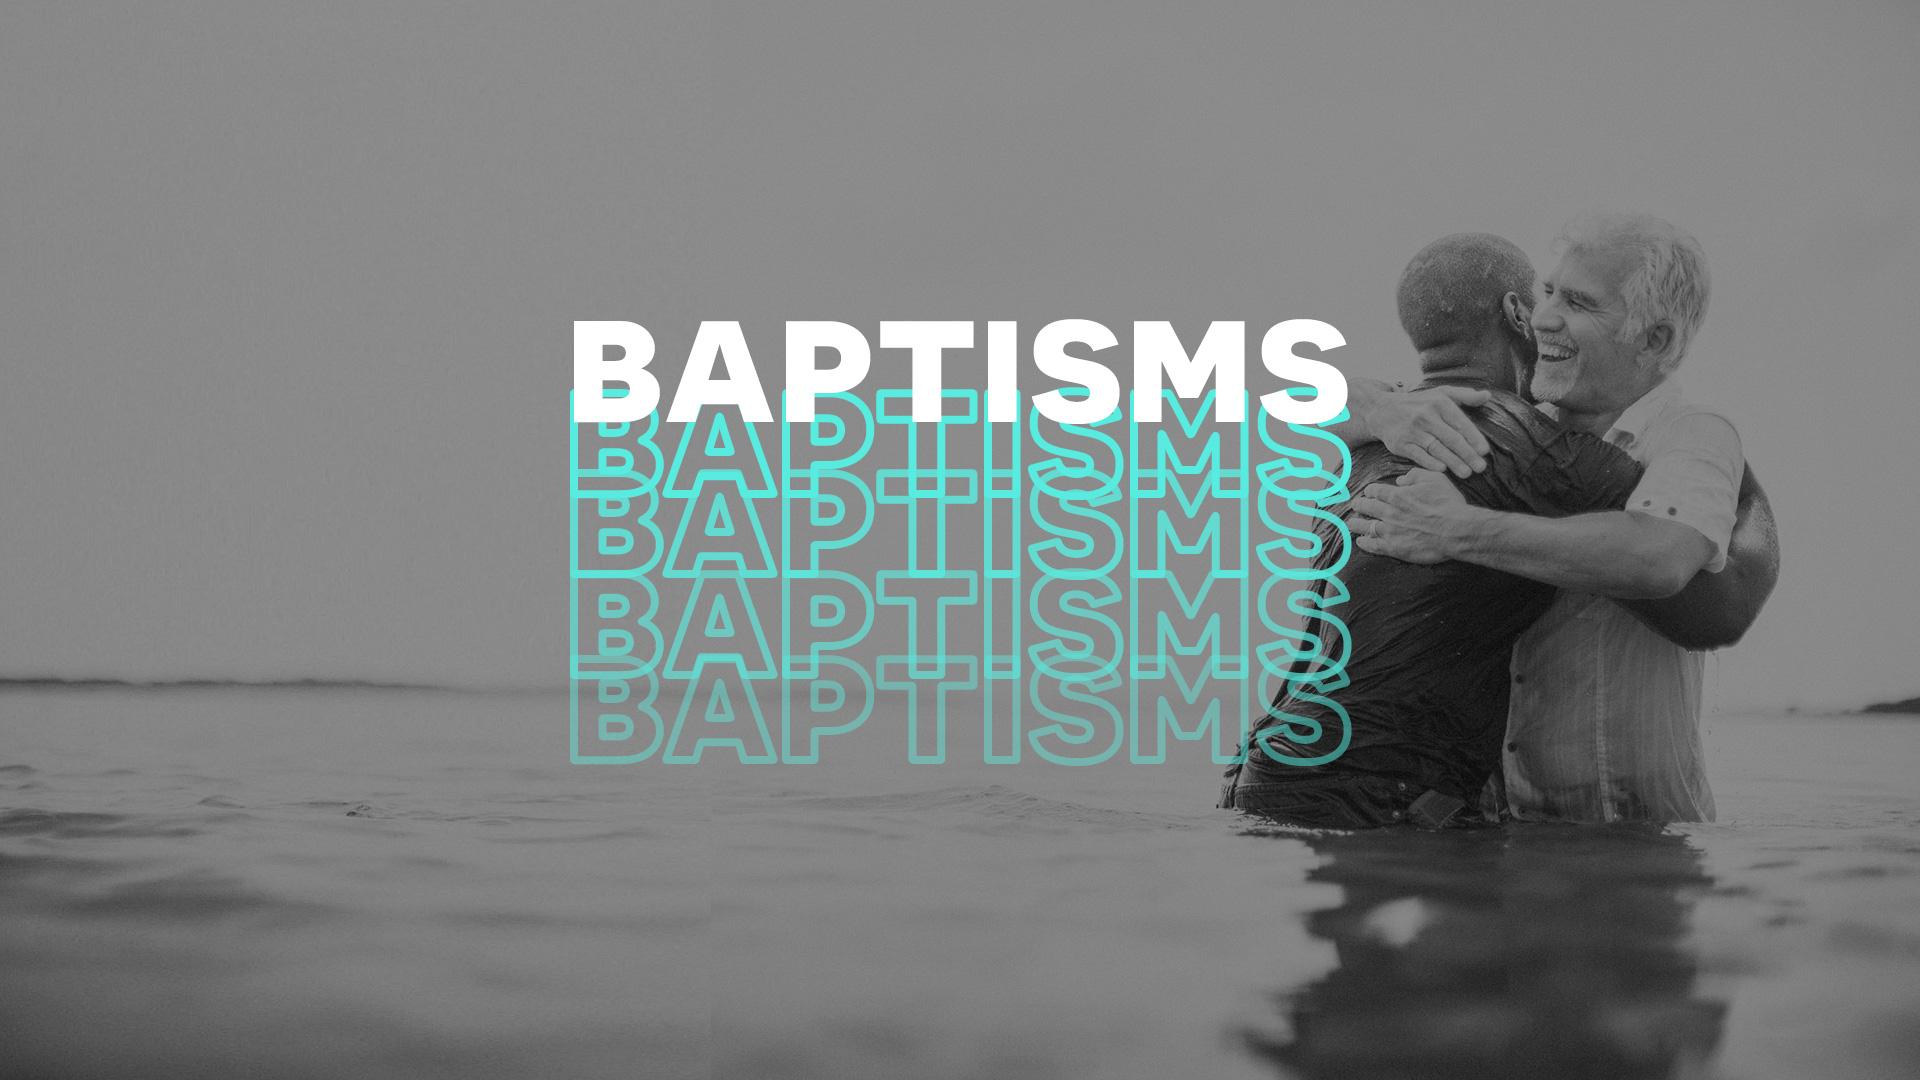 baptism-1920-no-branding.jpg